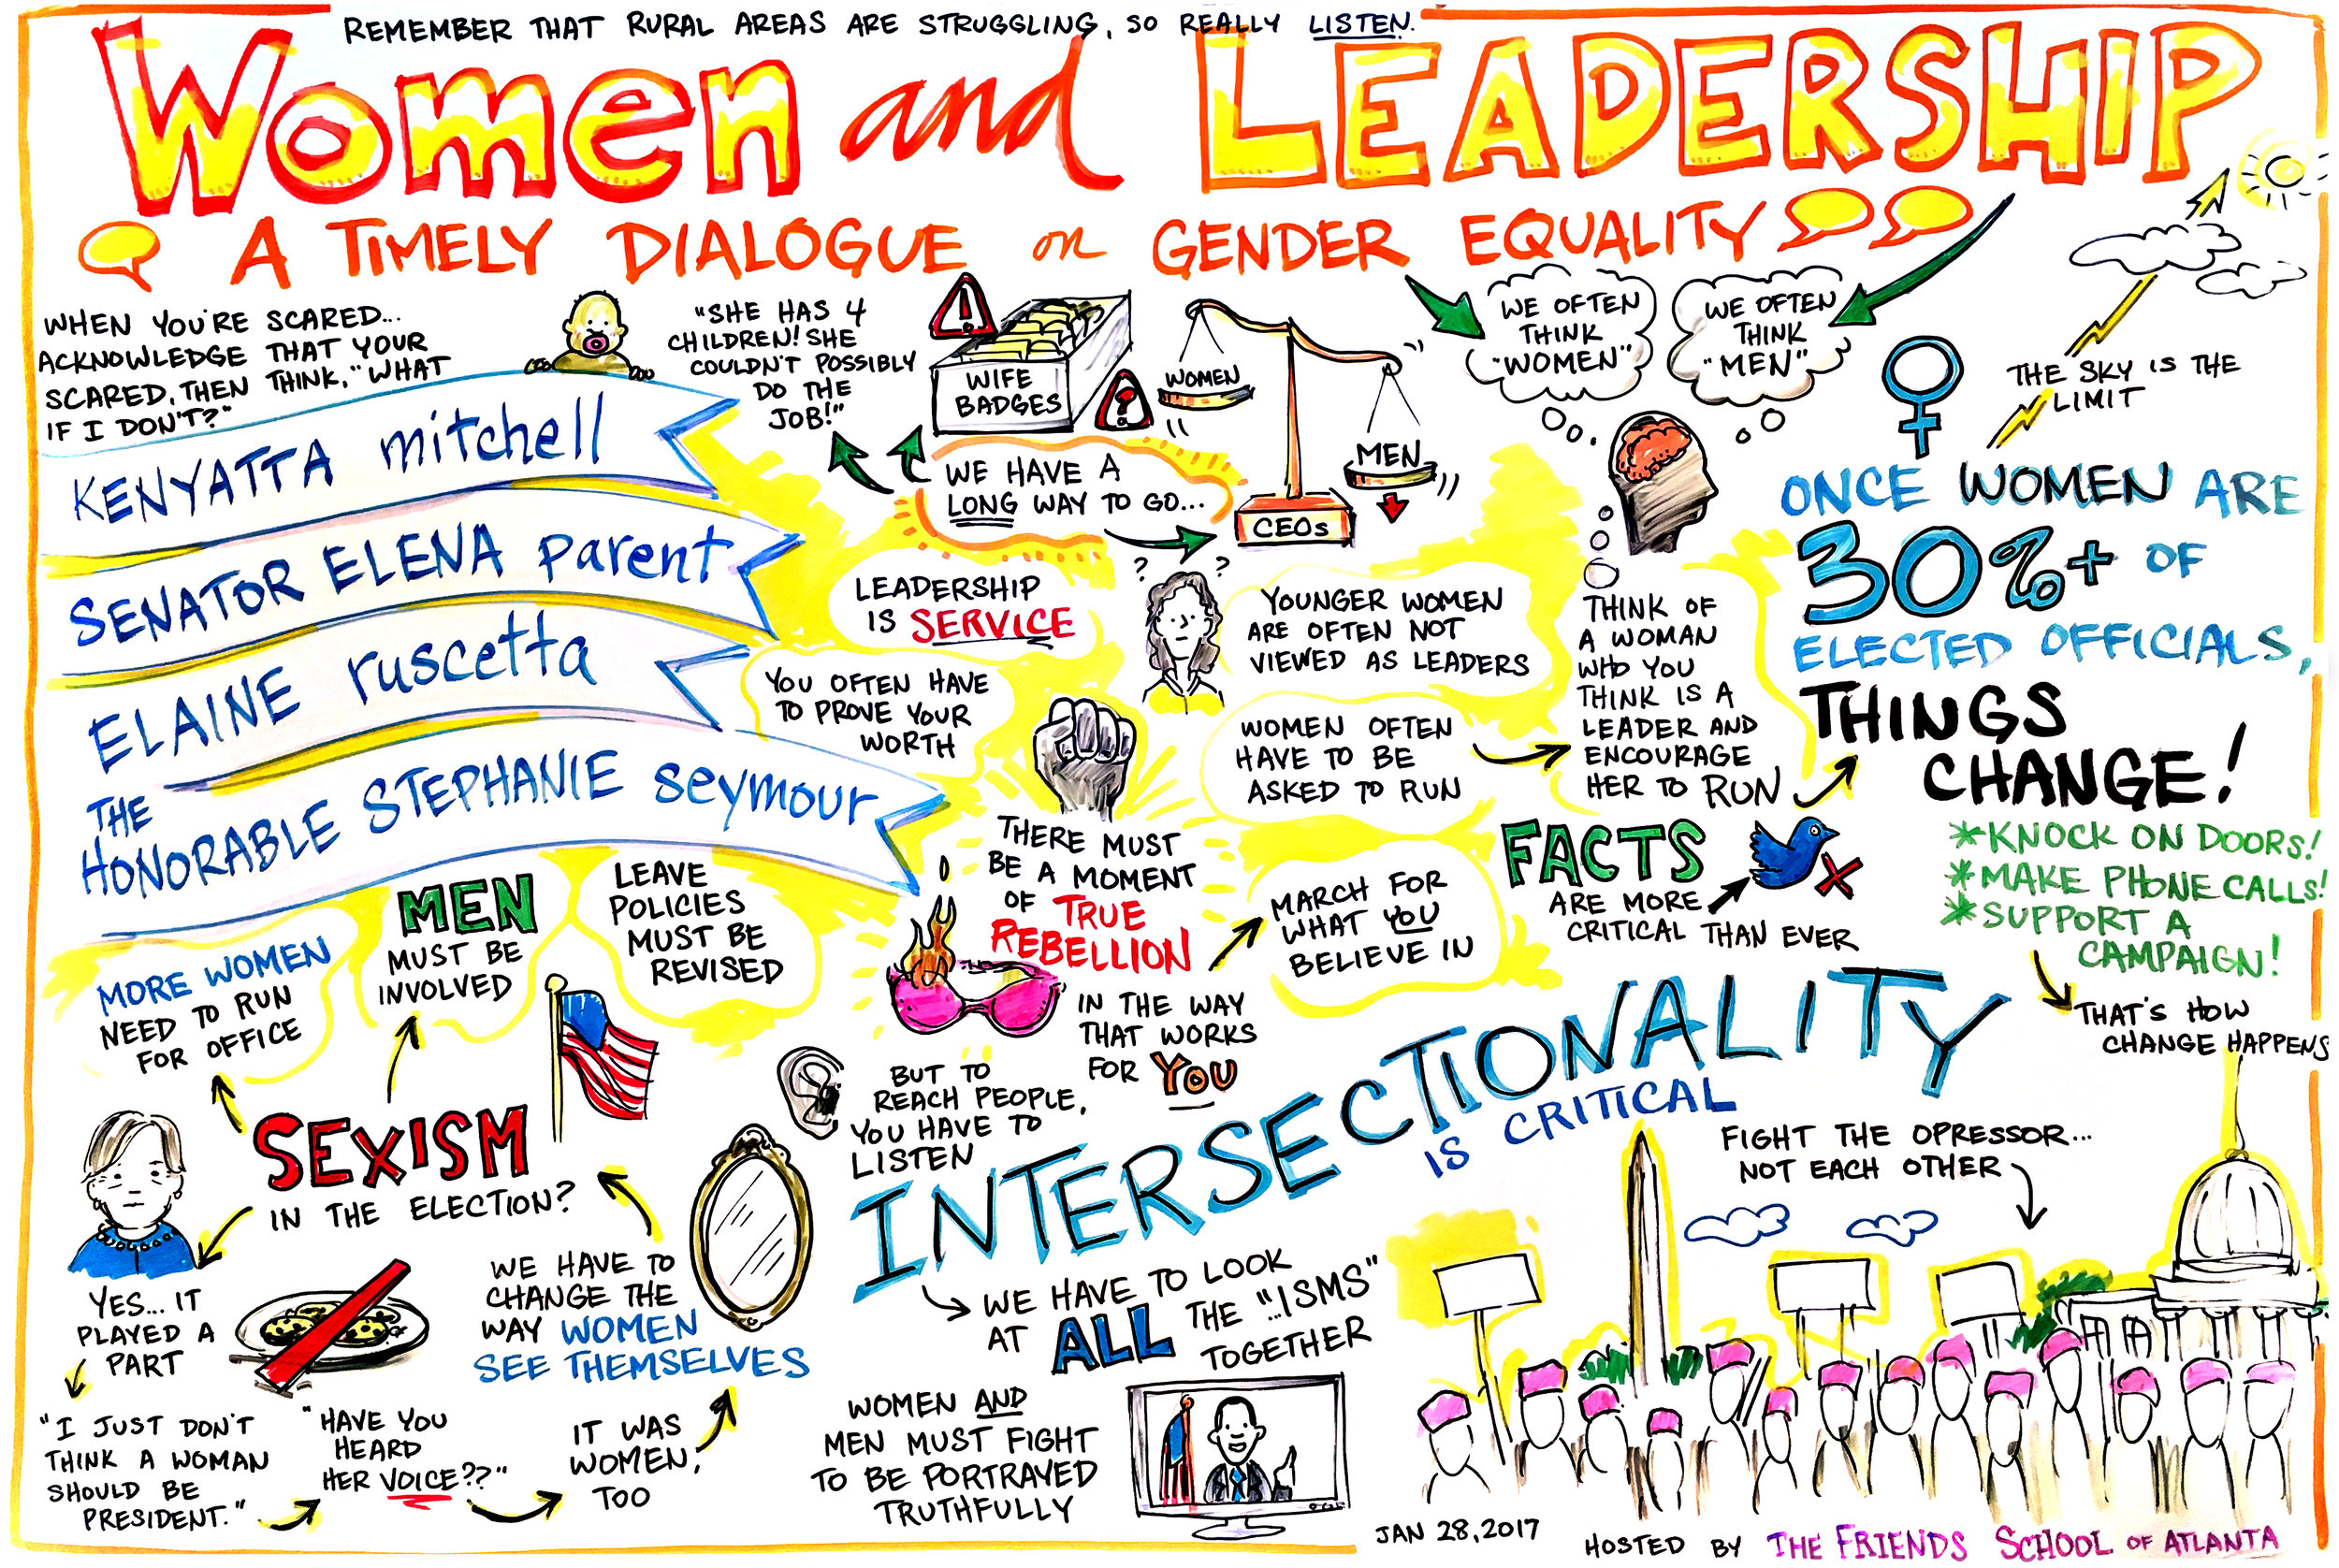 FSA_Women and Leadership.jpg